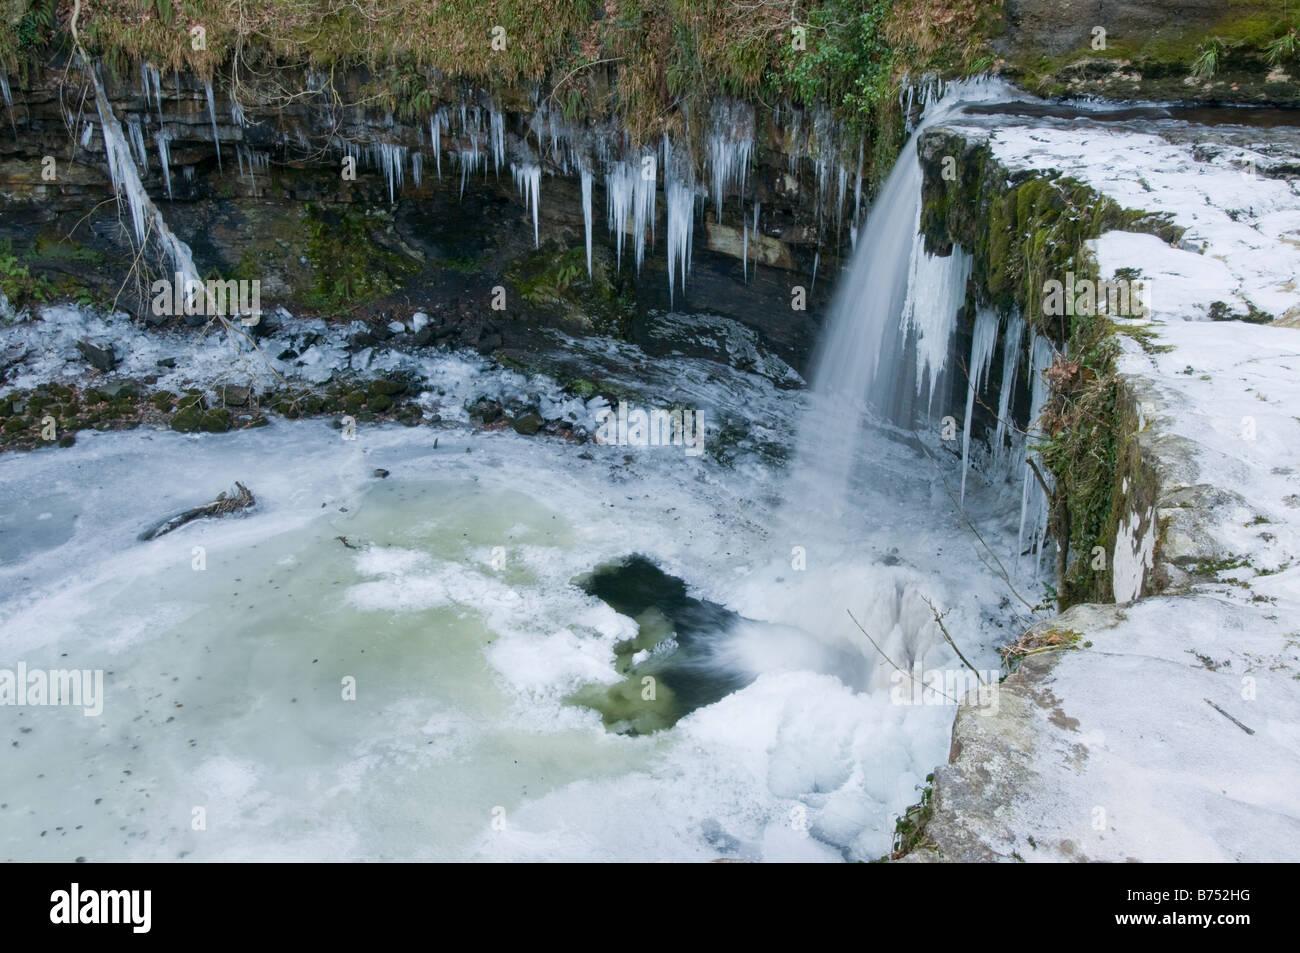 Sgwd Gwladys falls on the Afon Pyrddin after a winter cold snap. Stock Photo